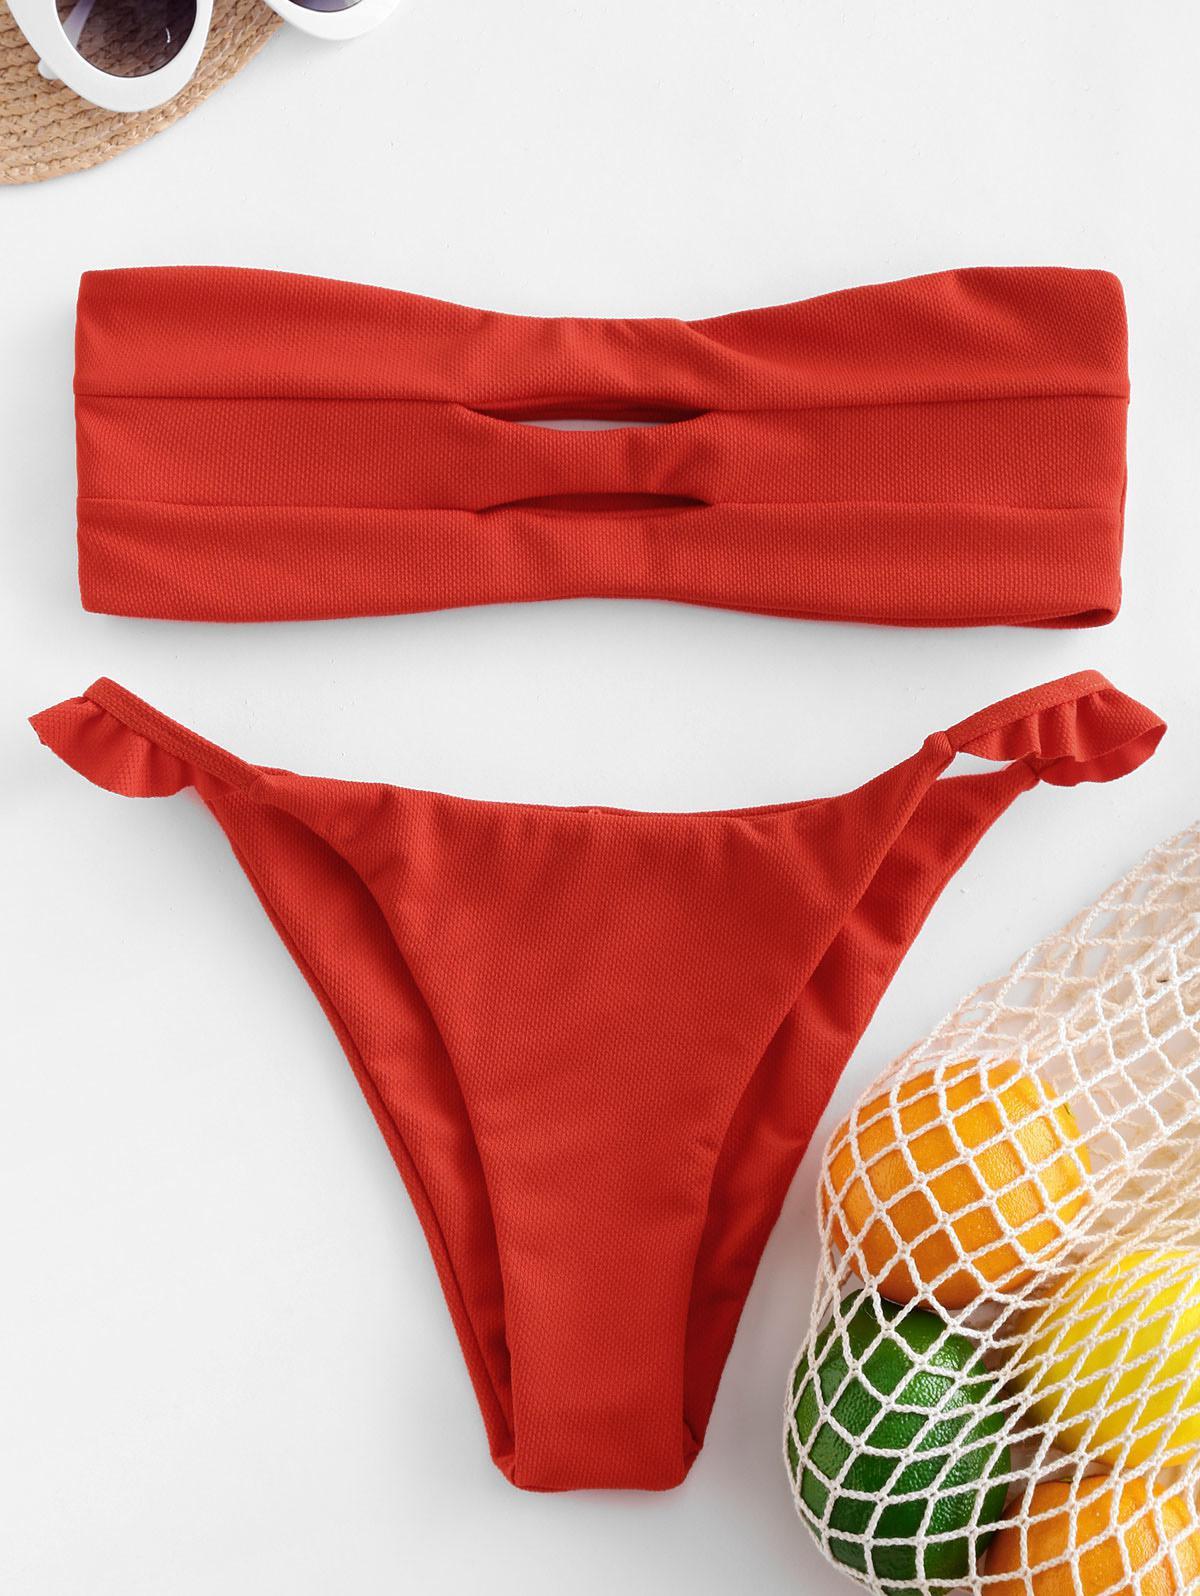 ZAFUL Maillot de Bain Bikini Bandeau Texturé Evidé à Volants M - Zaful FR - Modalova